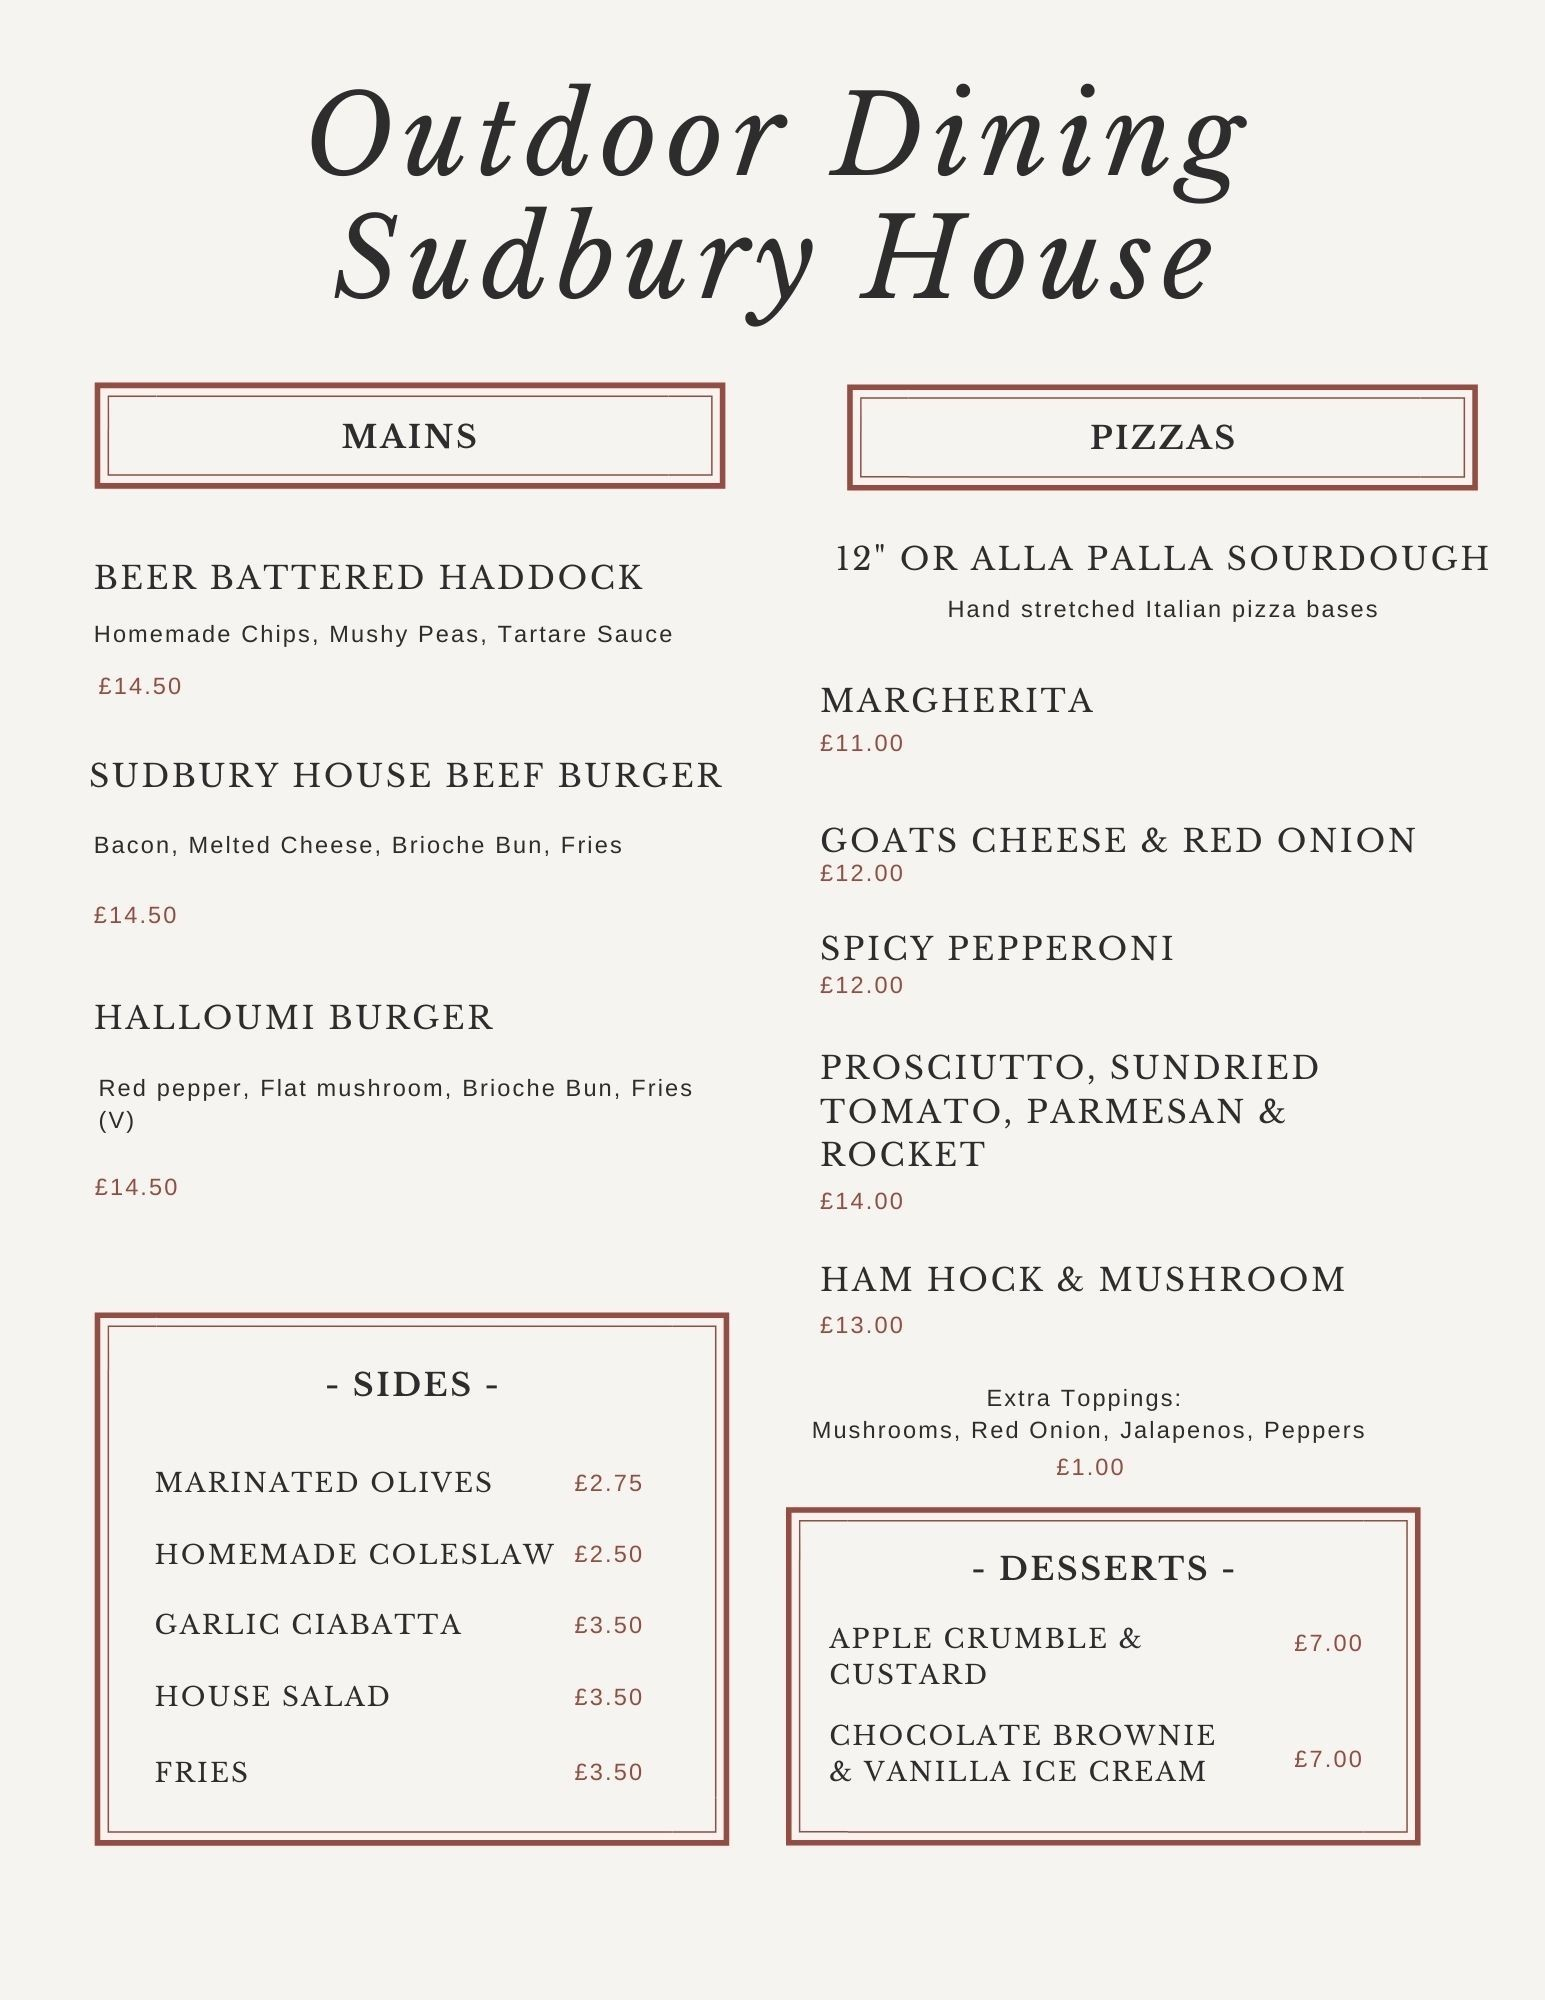 Outdoor dining menu